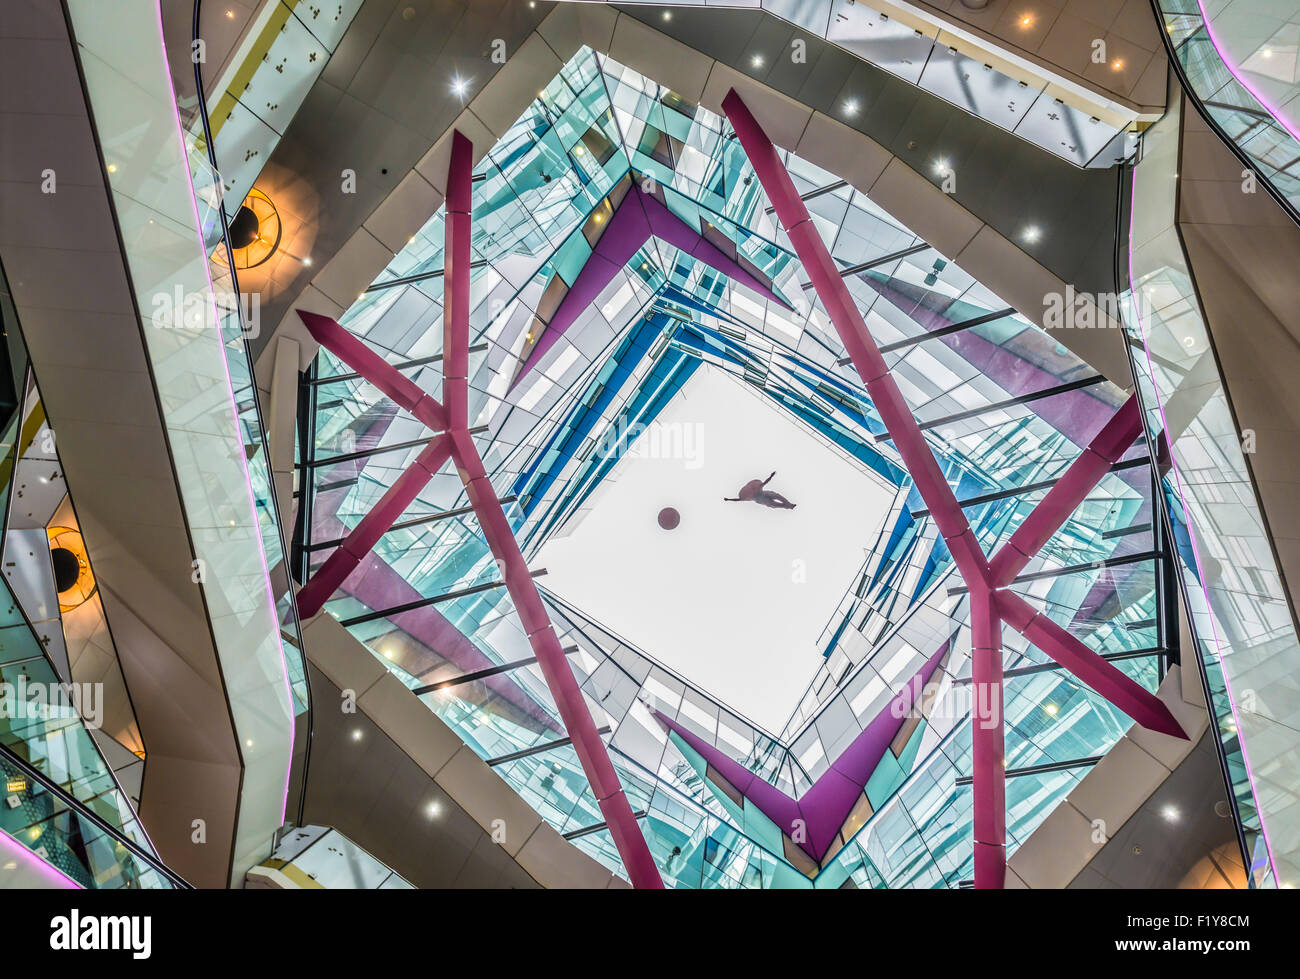 The Cube interiors, Birmingham Stock Photo: 87265828 - Alamy